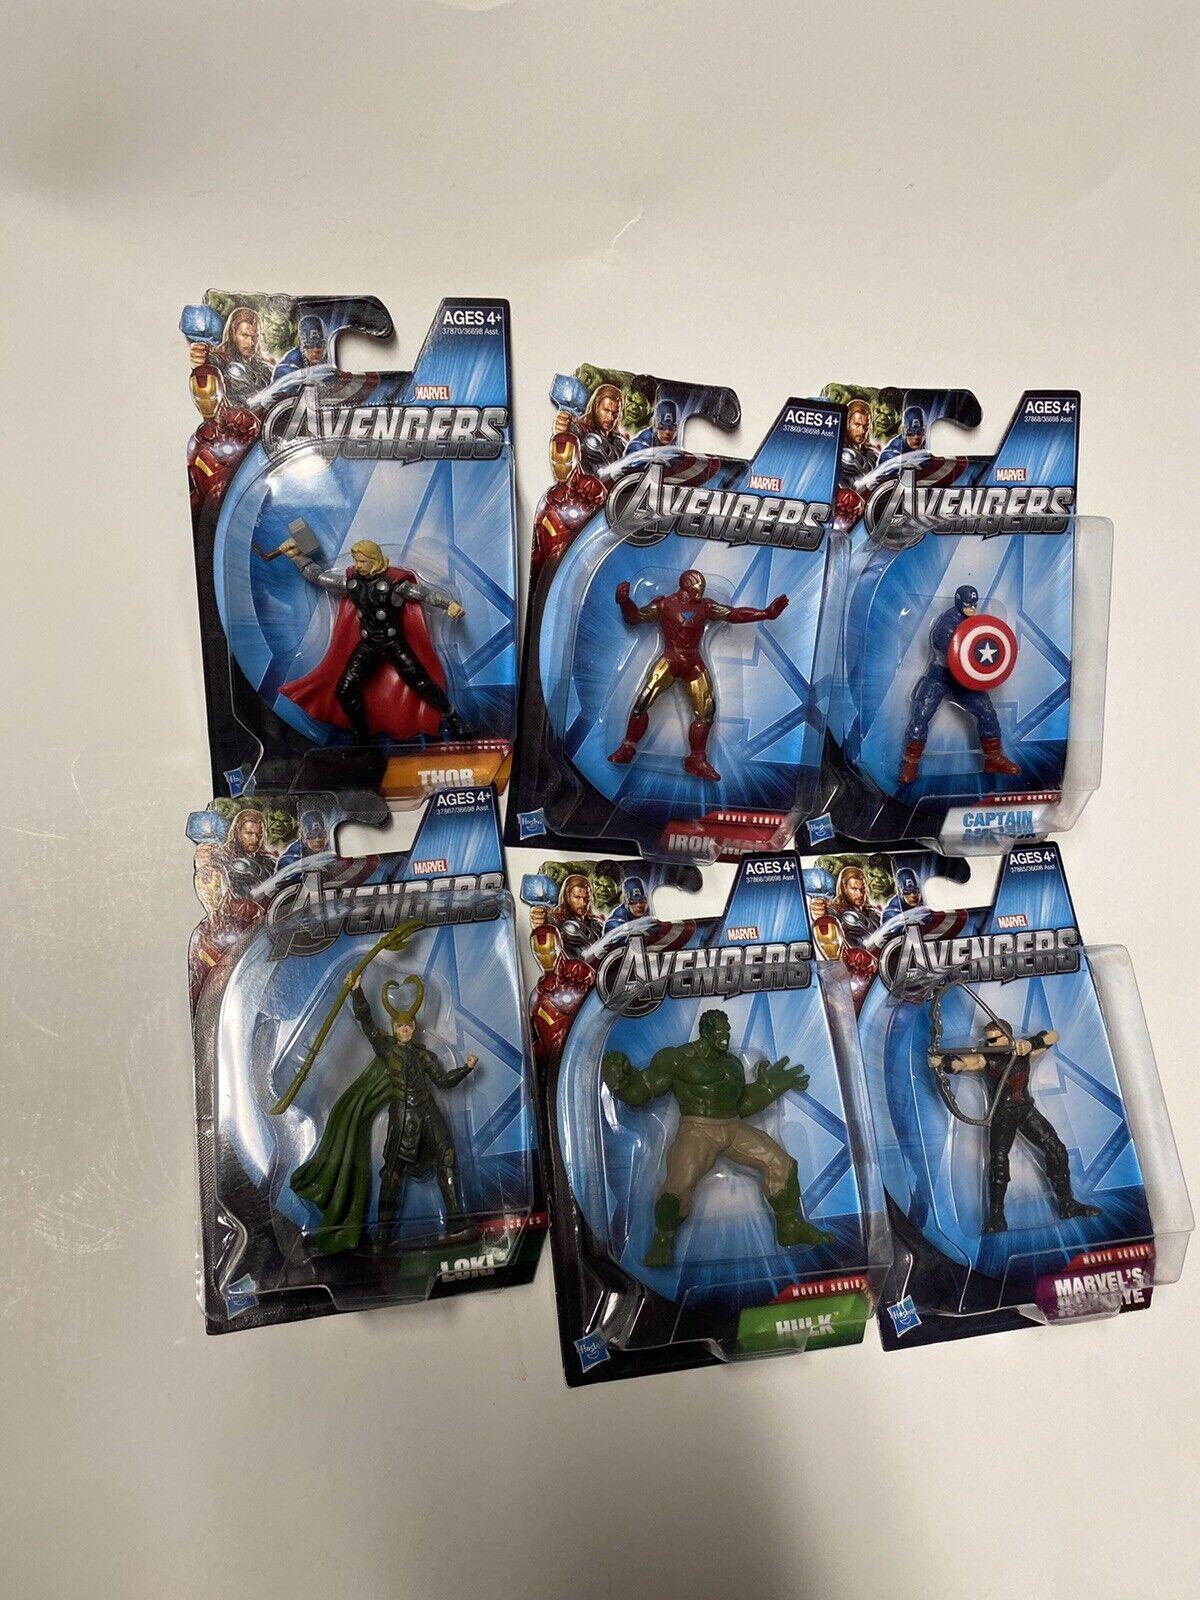 Marvel Avengers Movie Series Mini cifras completare Set primero Avengers Movie